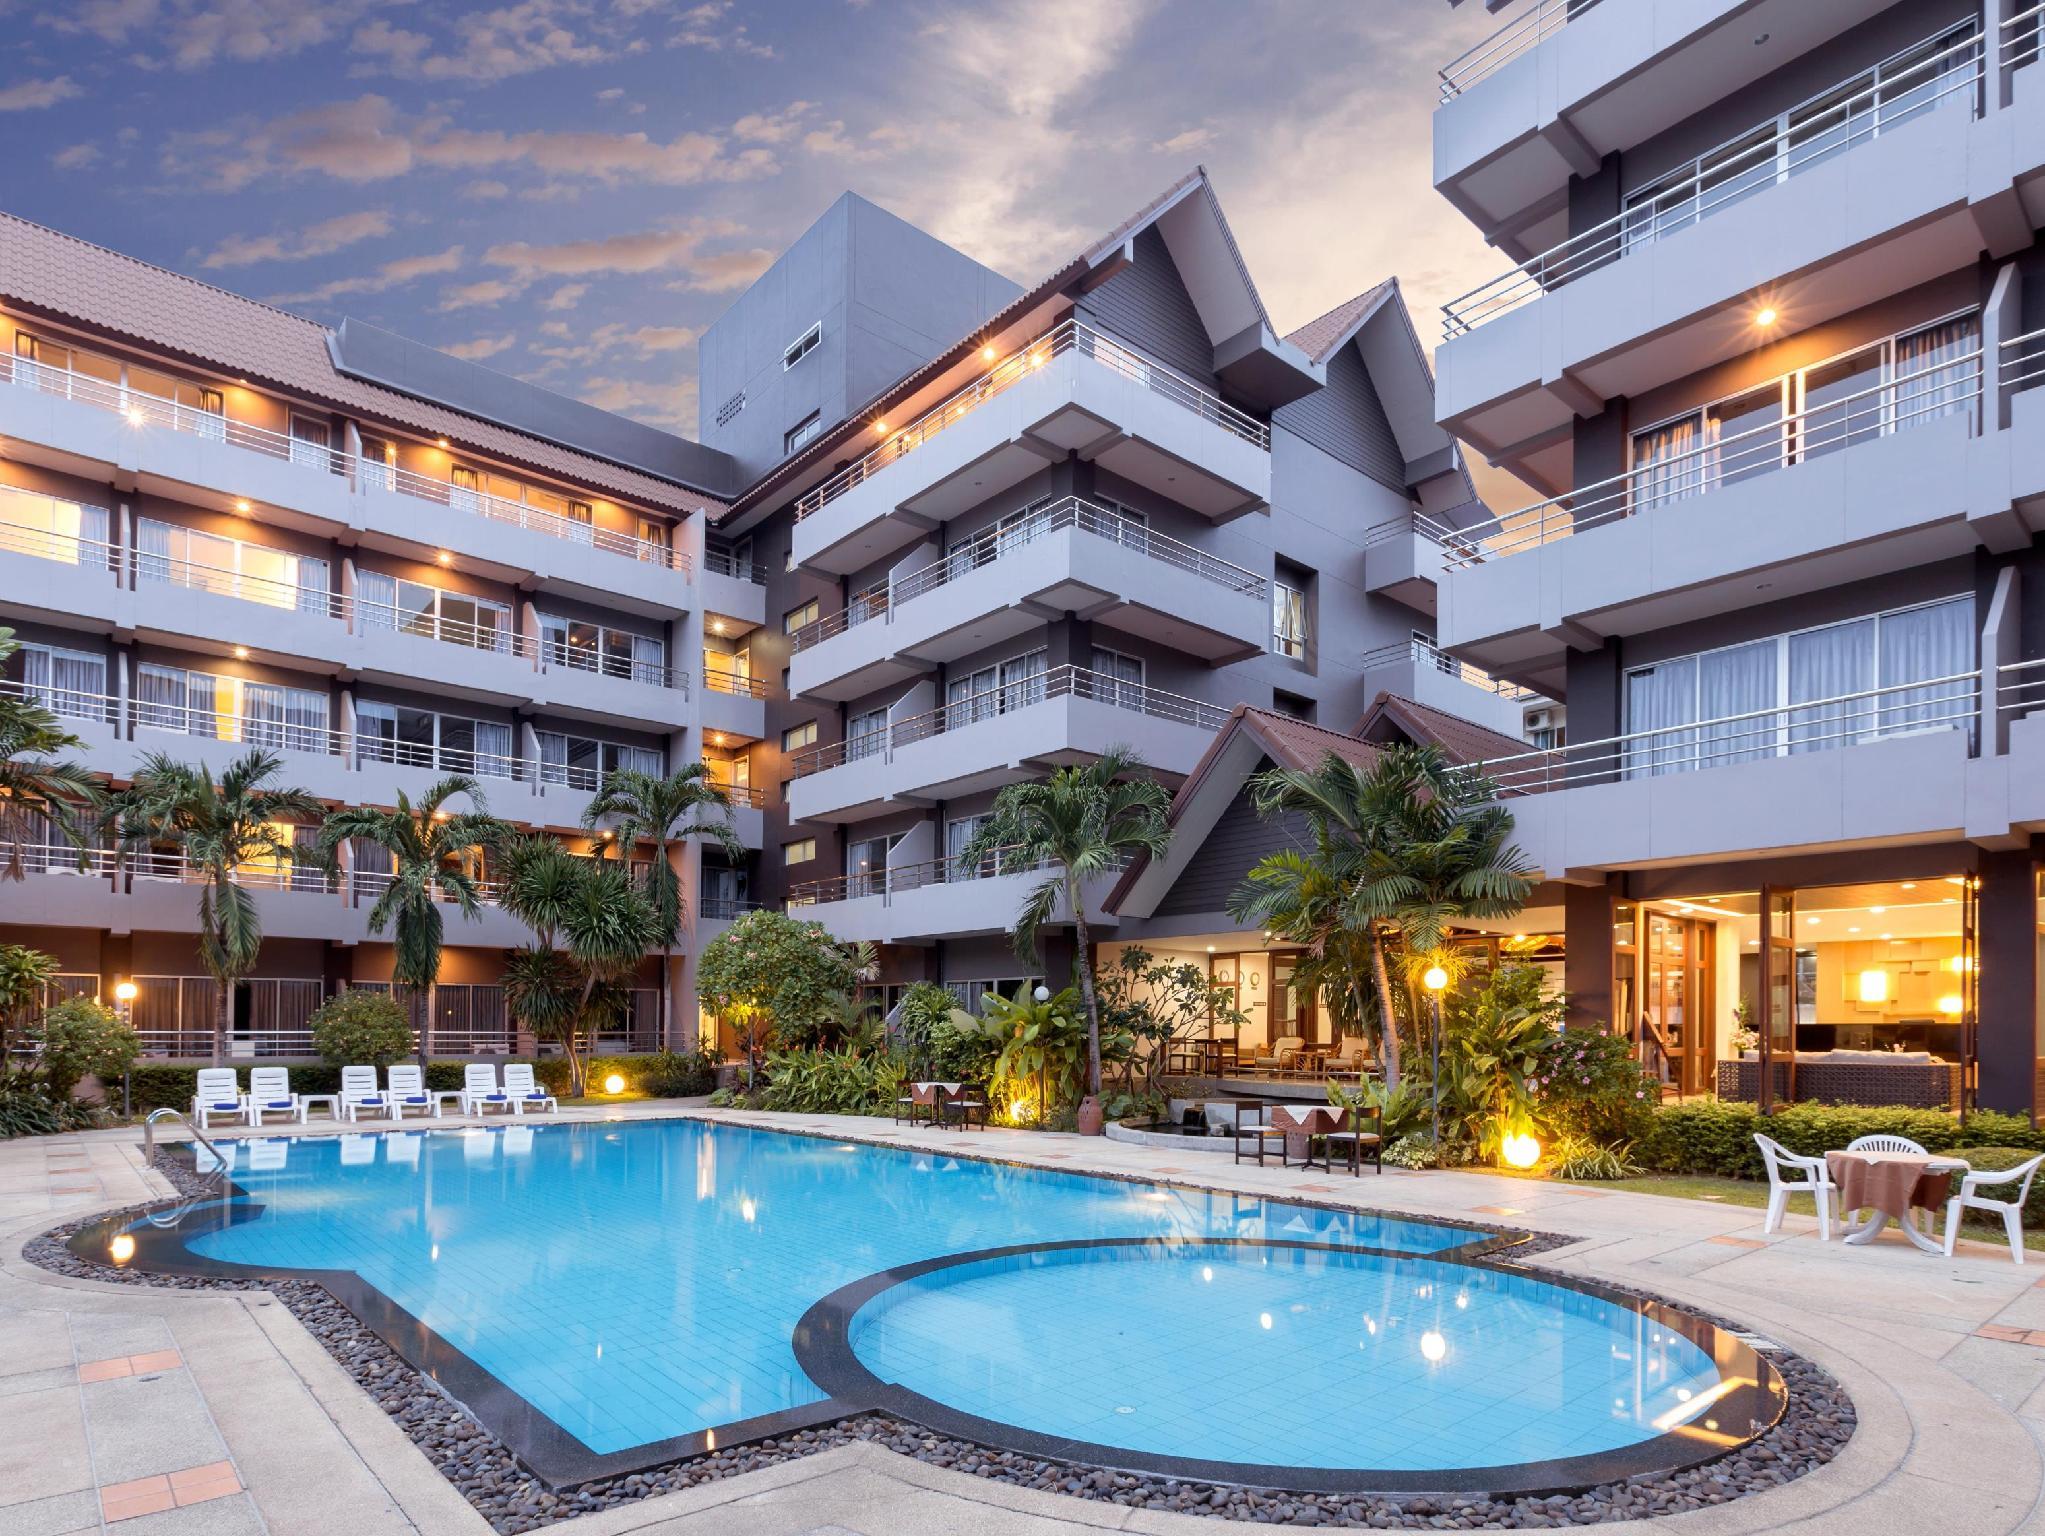 Holiday Spa Hotel Room Rates